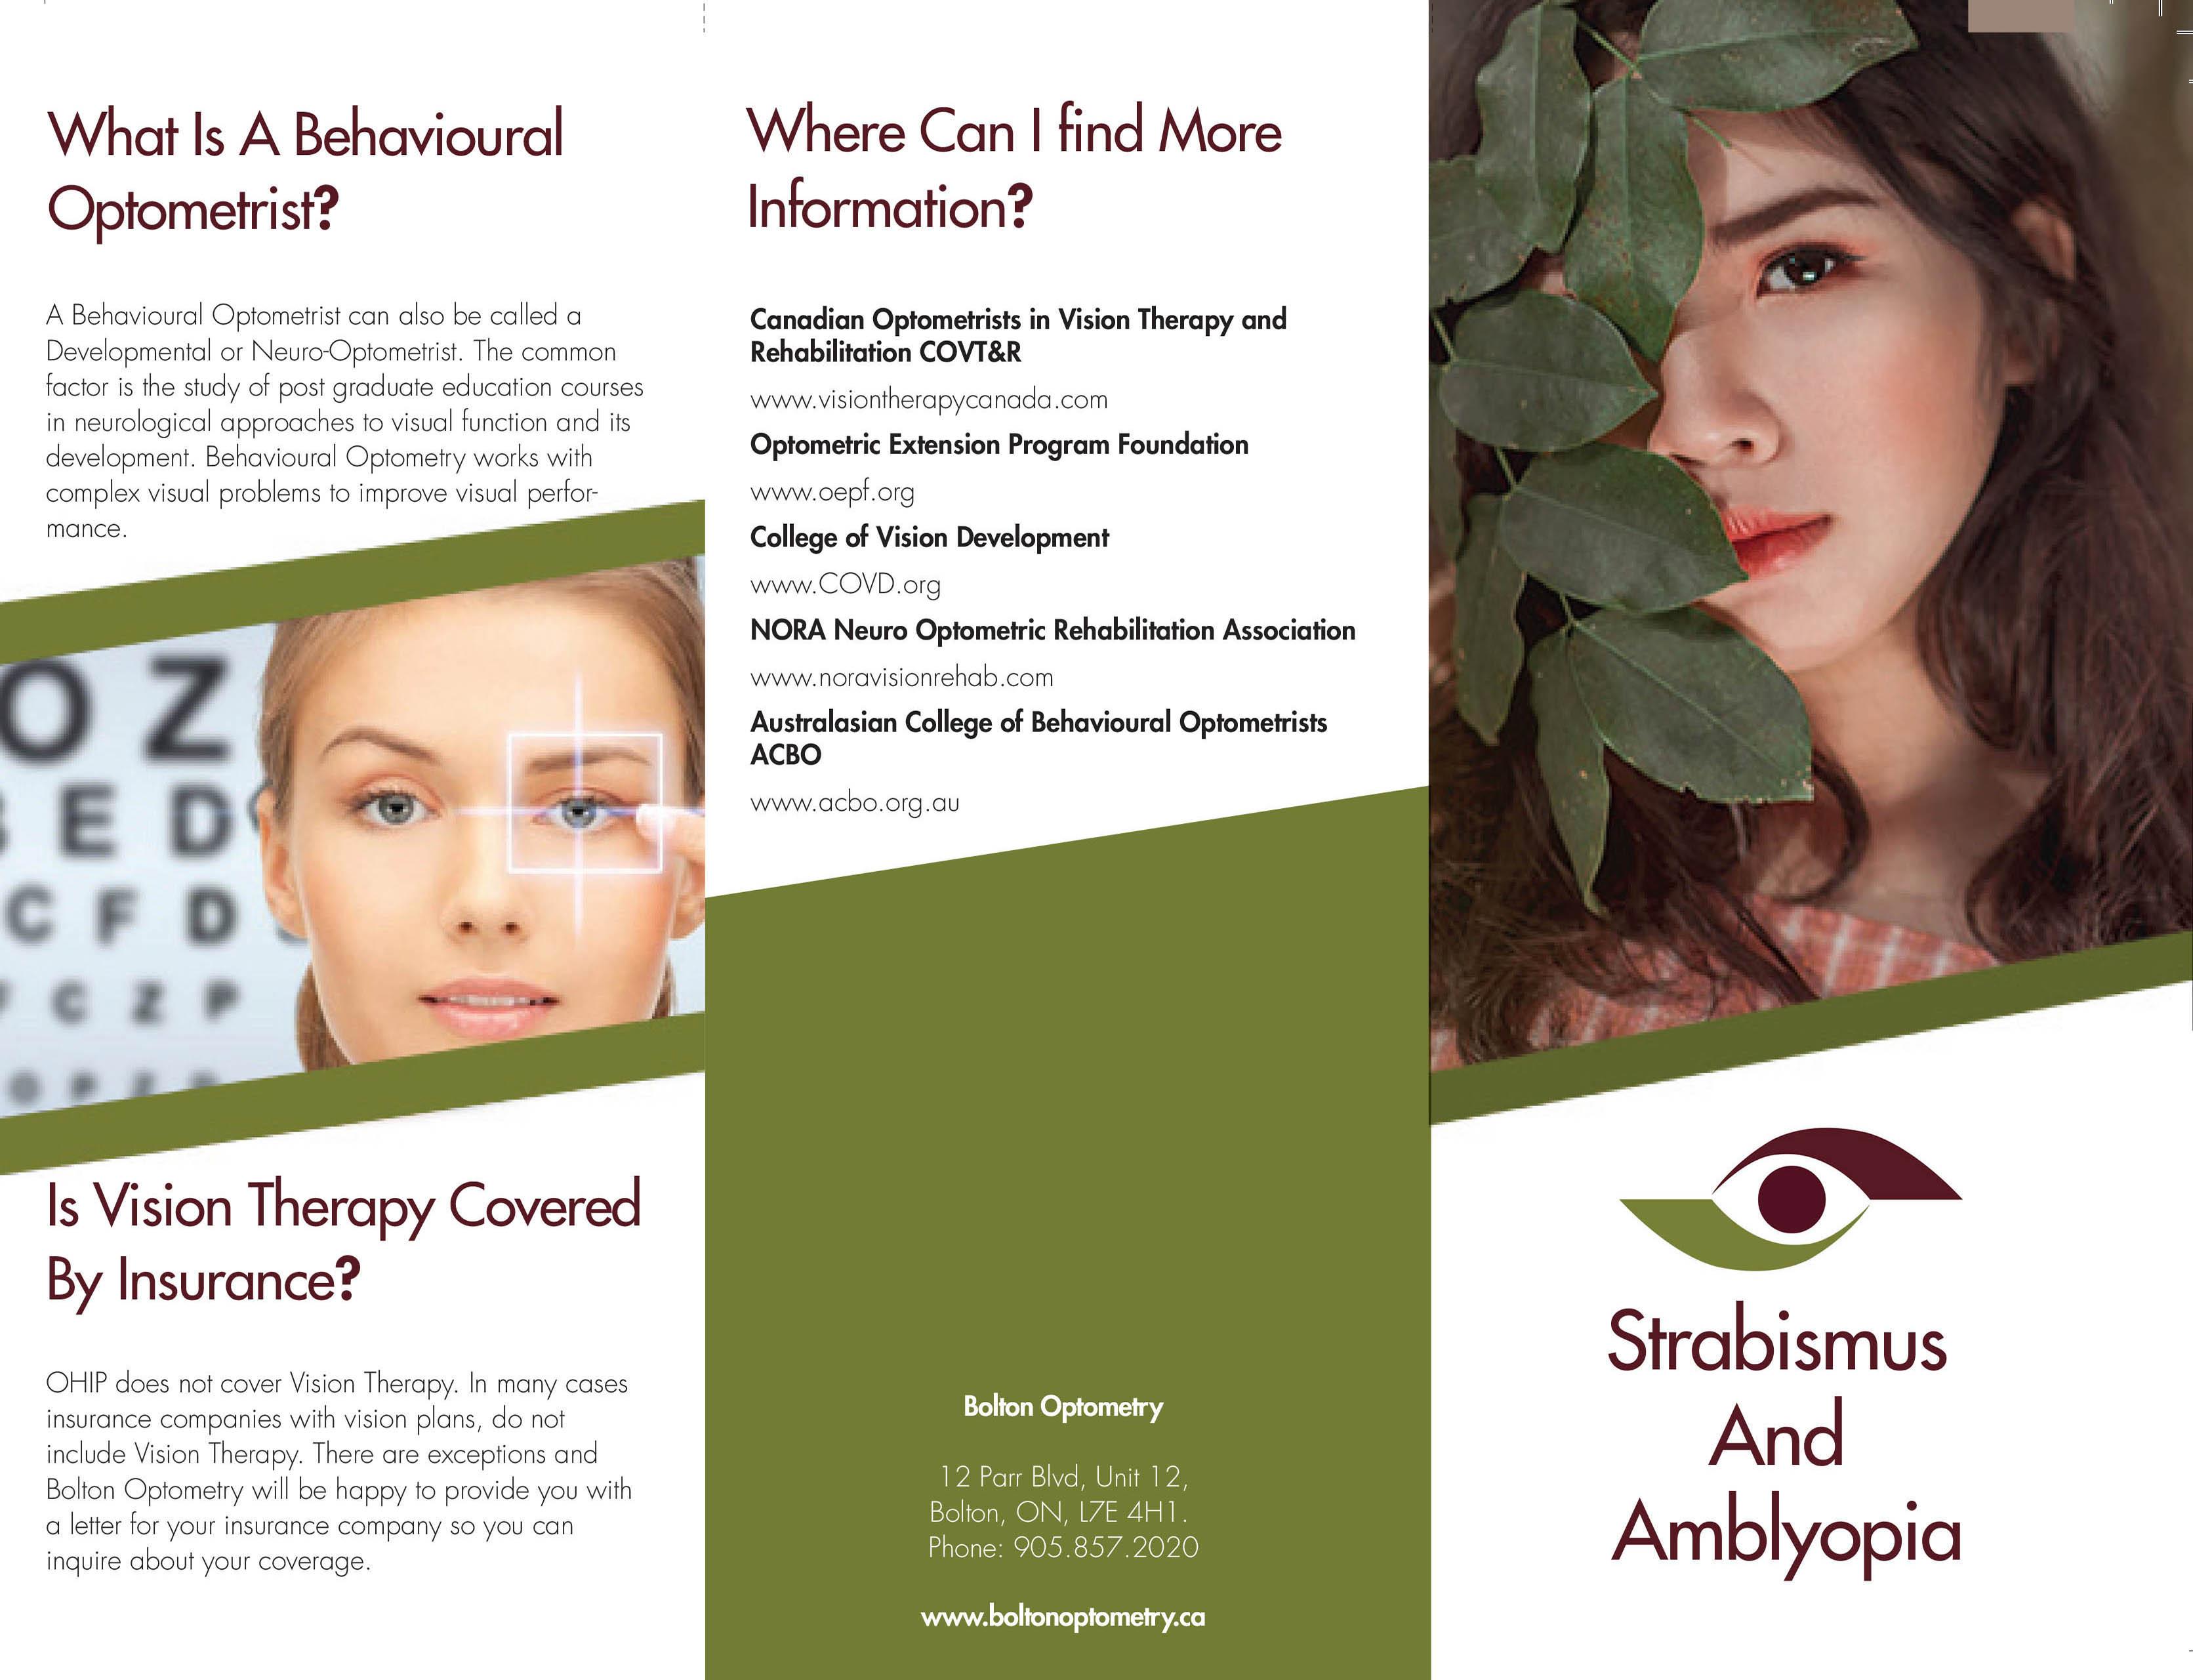 TriFold Strabismus Amblyopia Leaflet 2